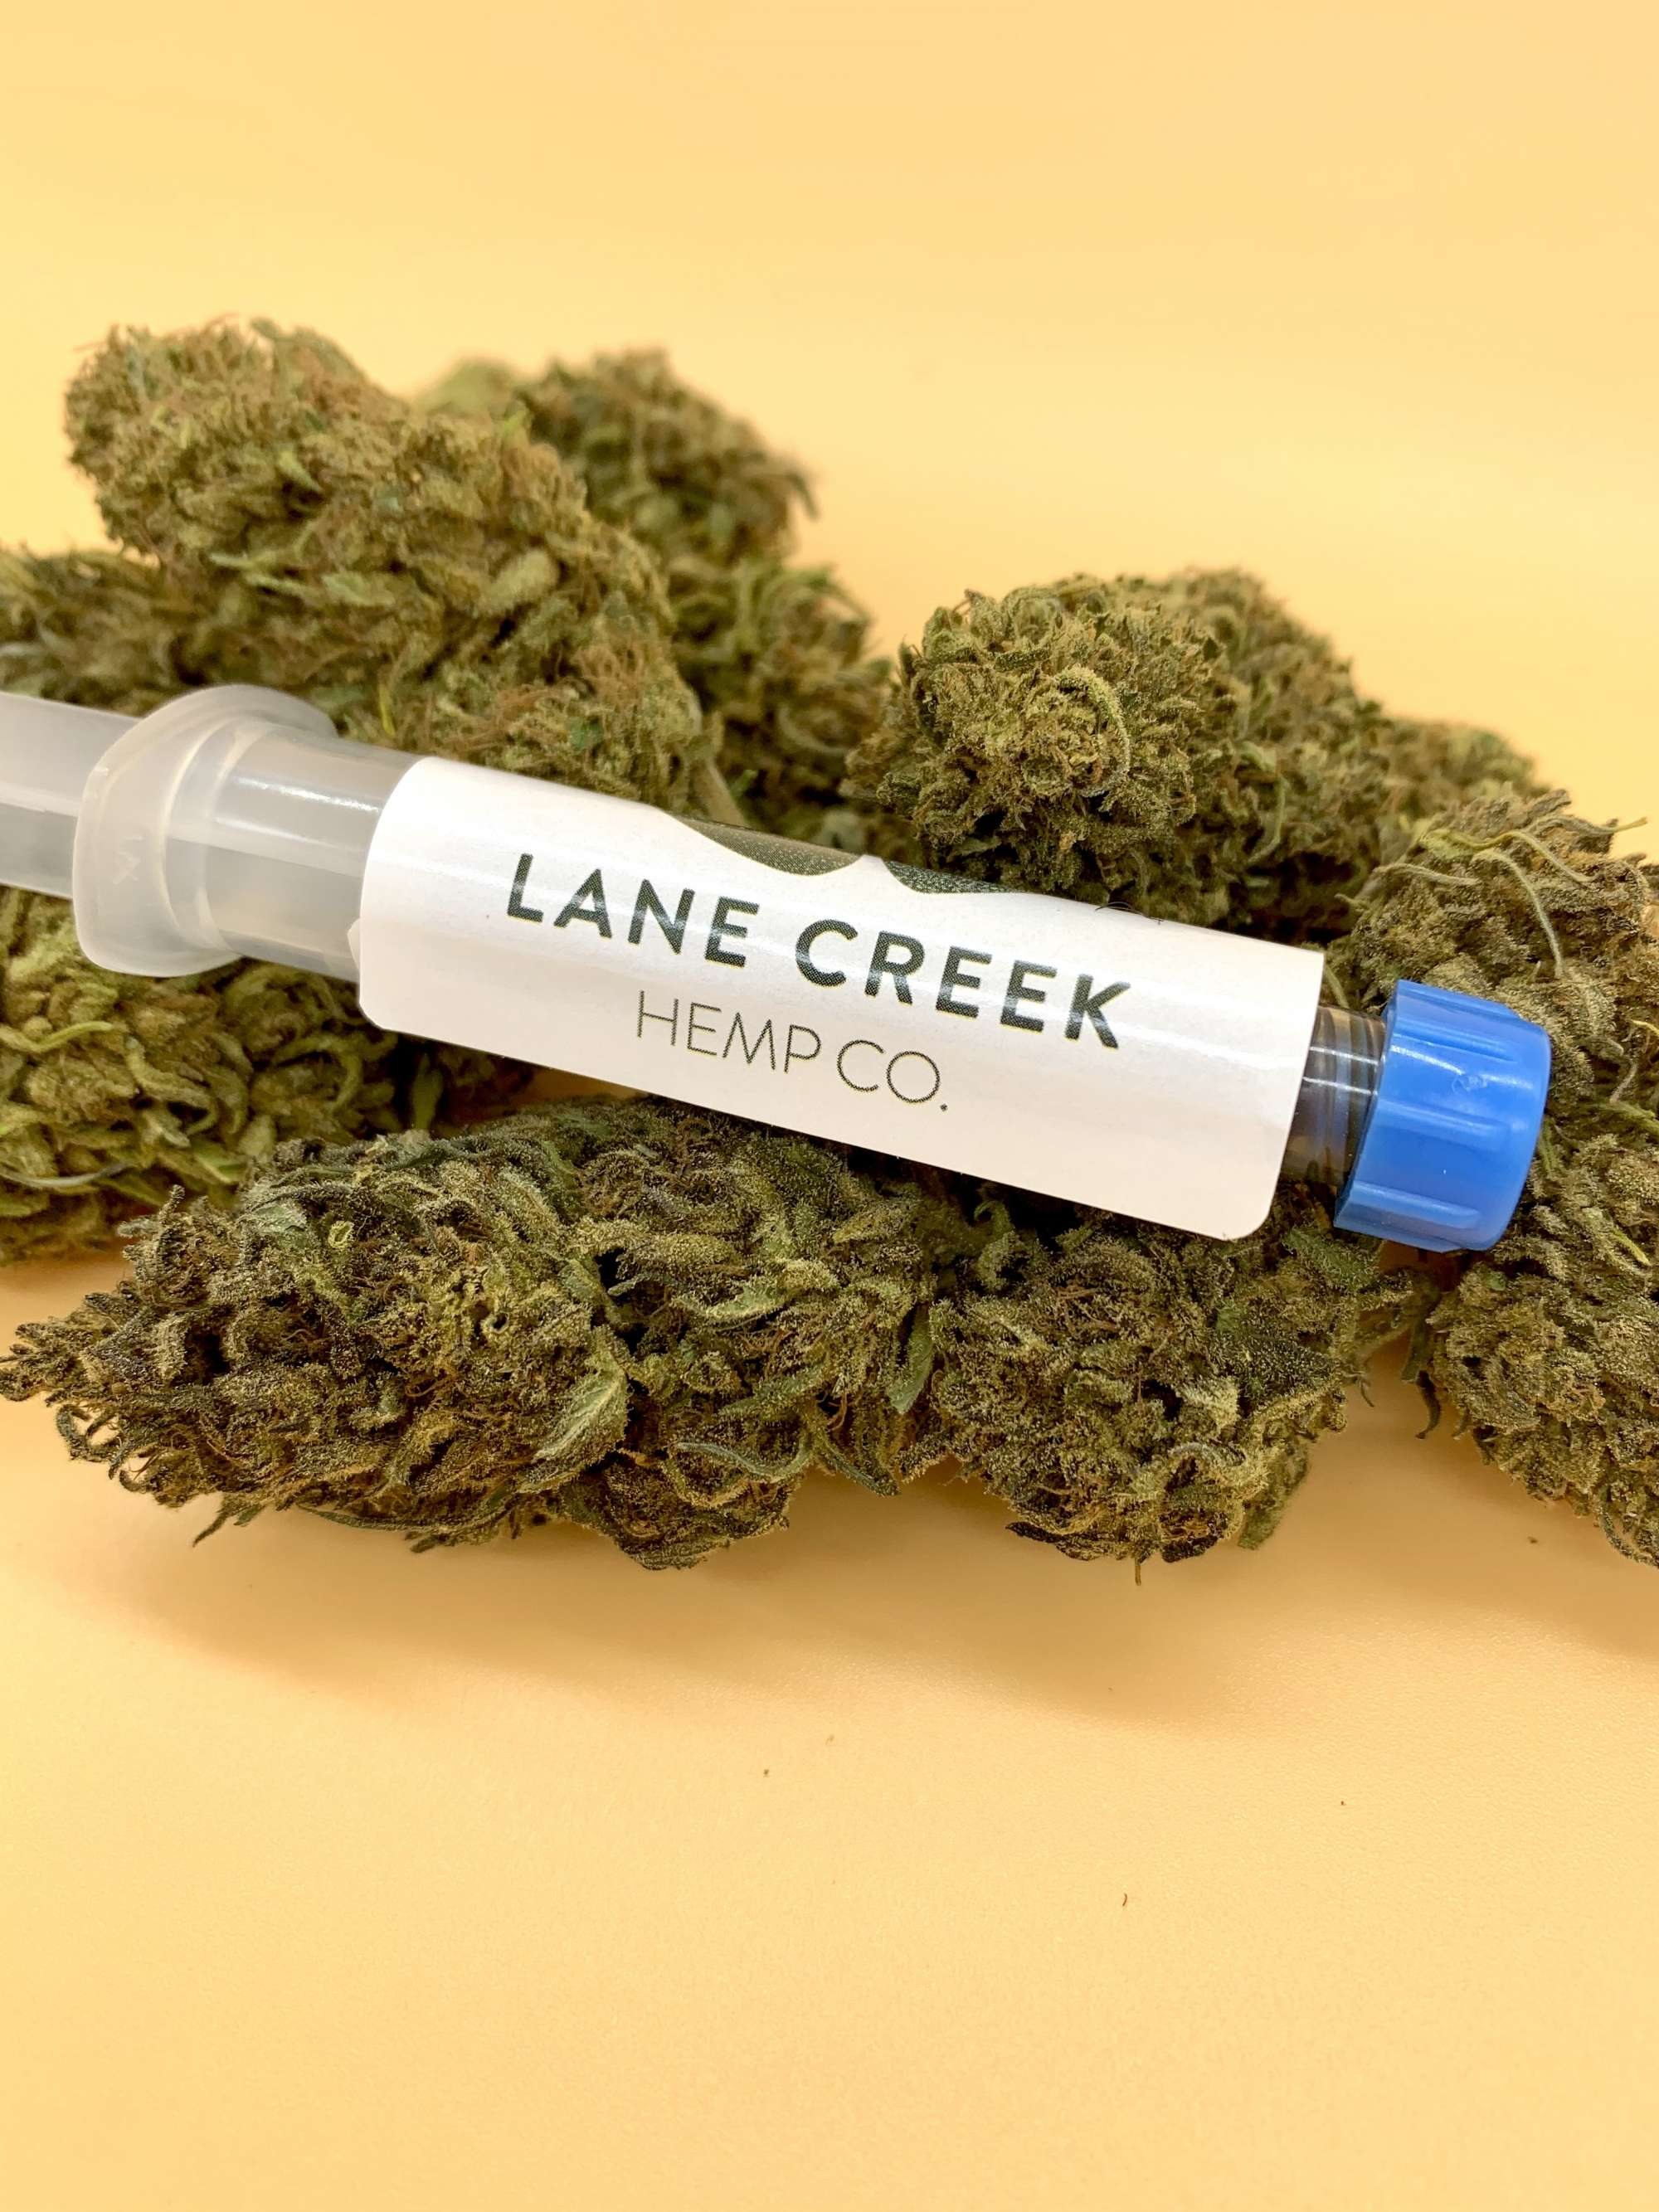 Crude 5mg/cc Syringe Lane Creek Hemp Co